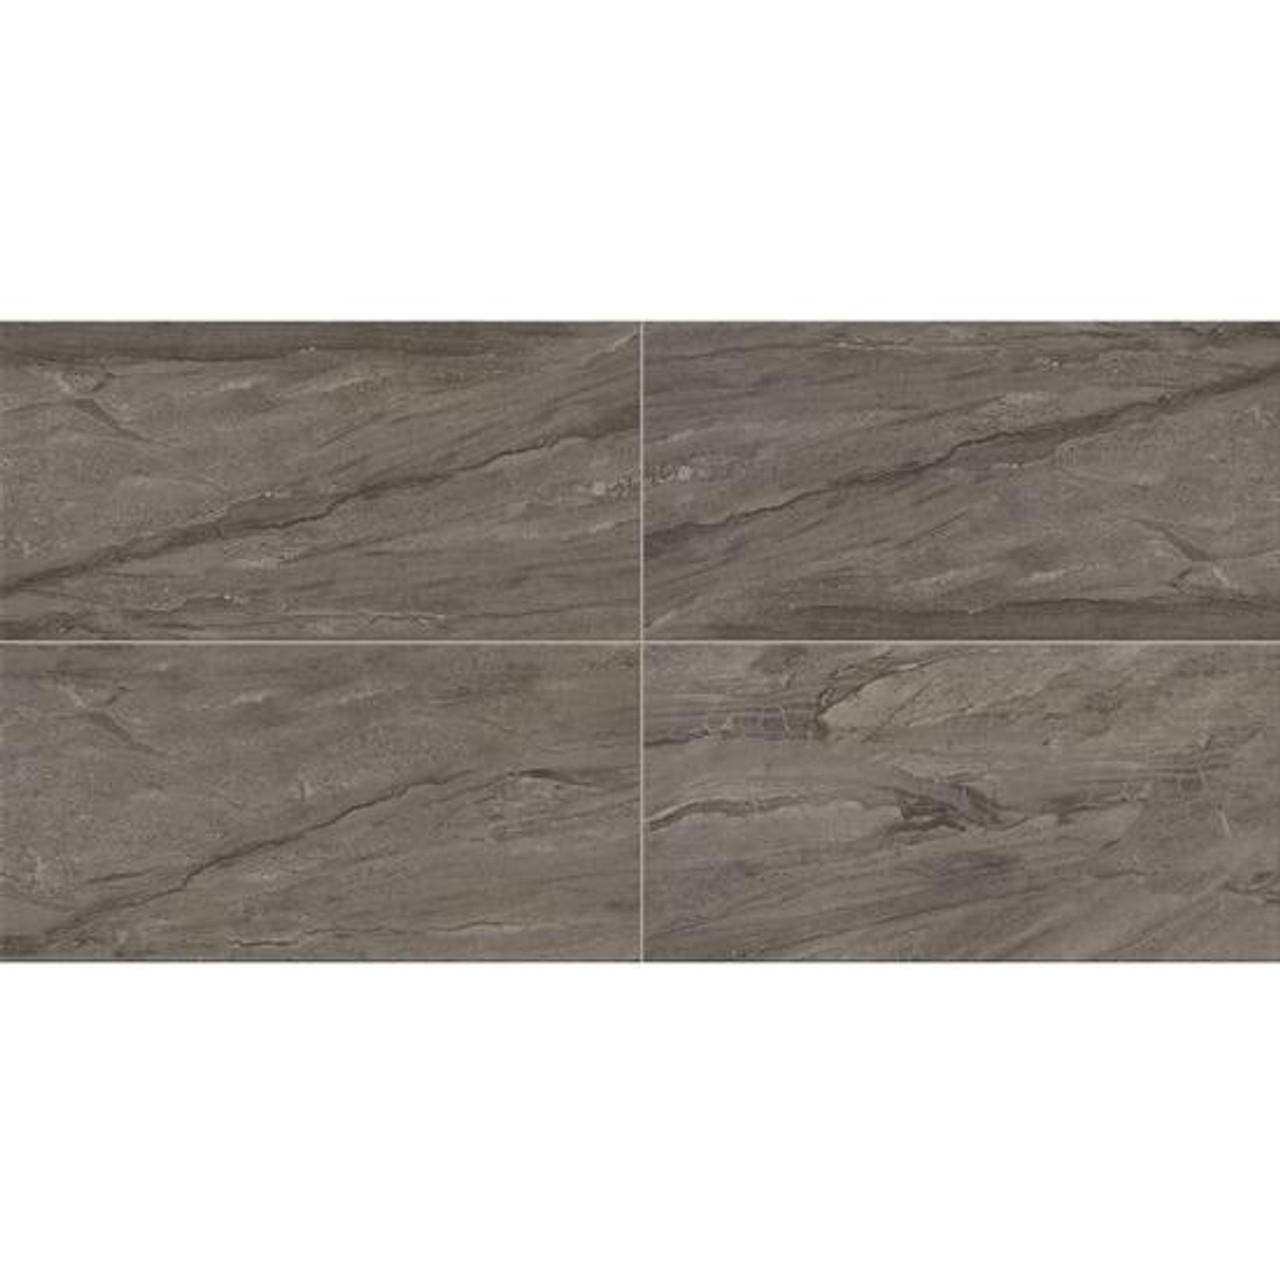 12x24 ceramic floor tile inspirations